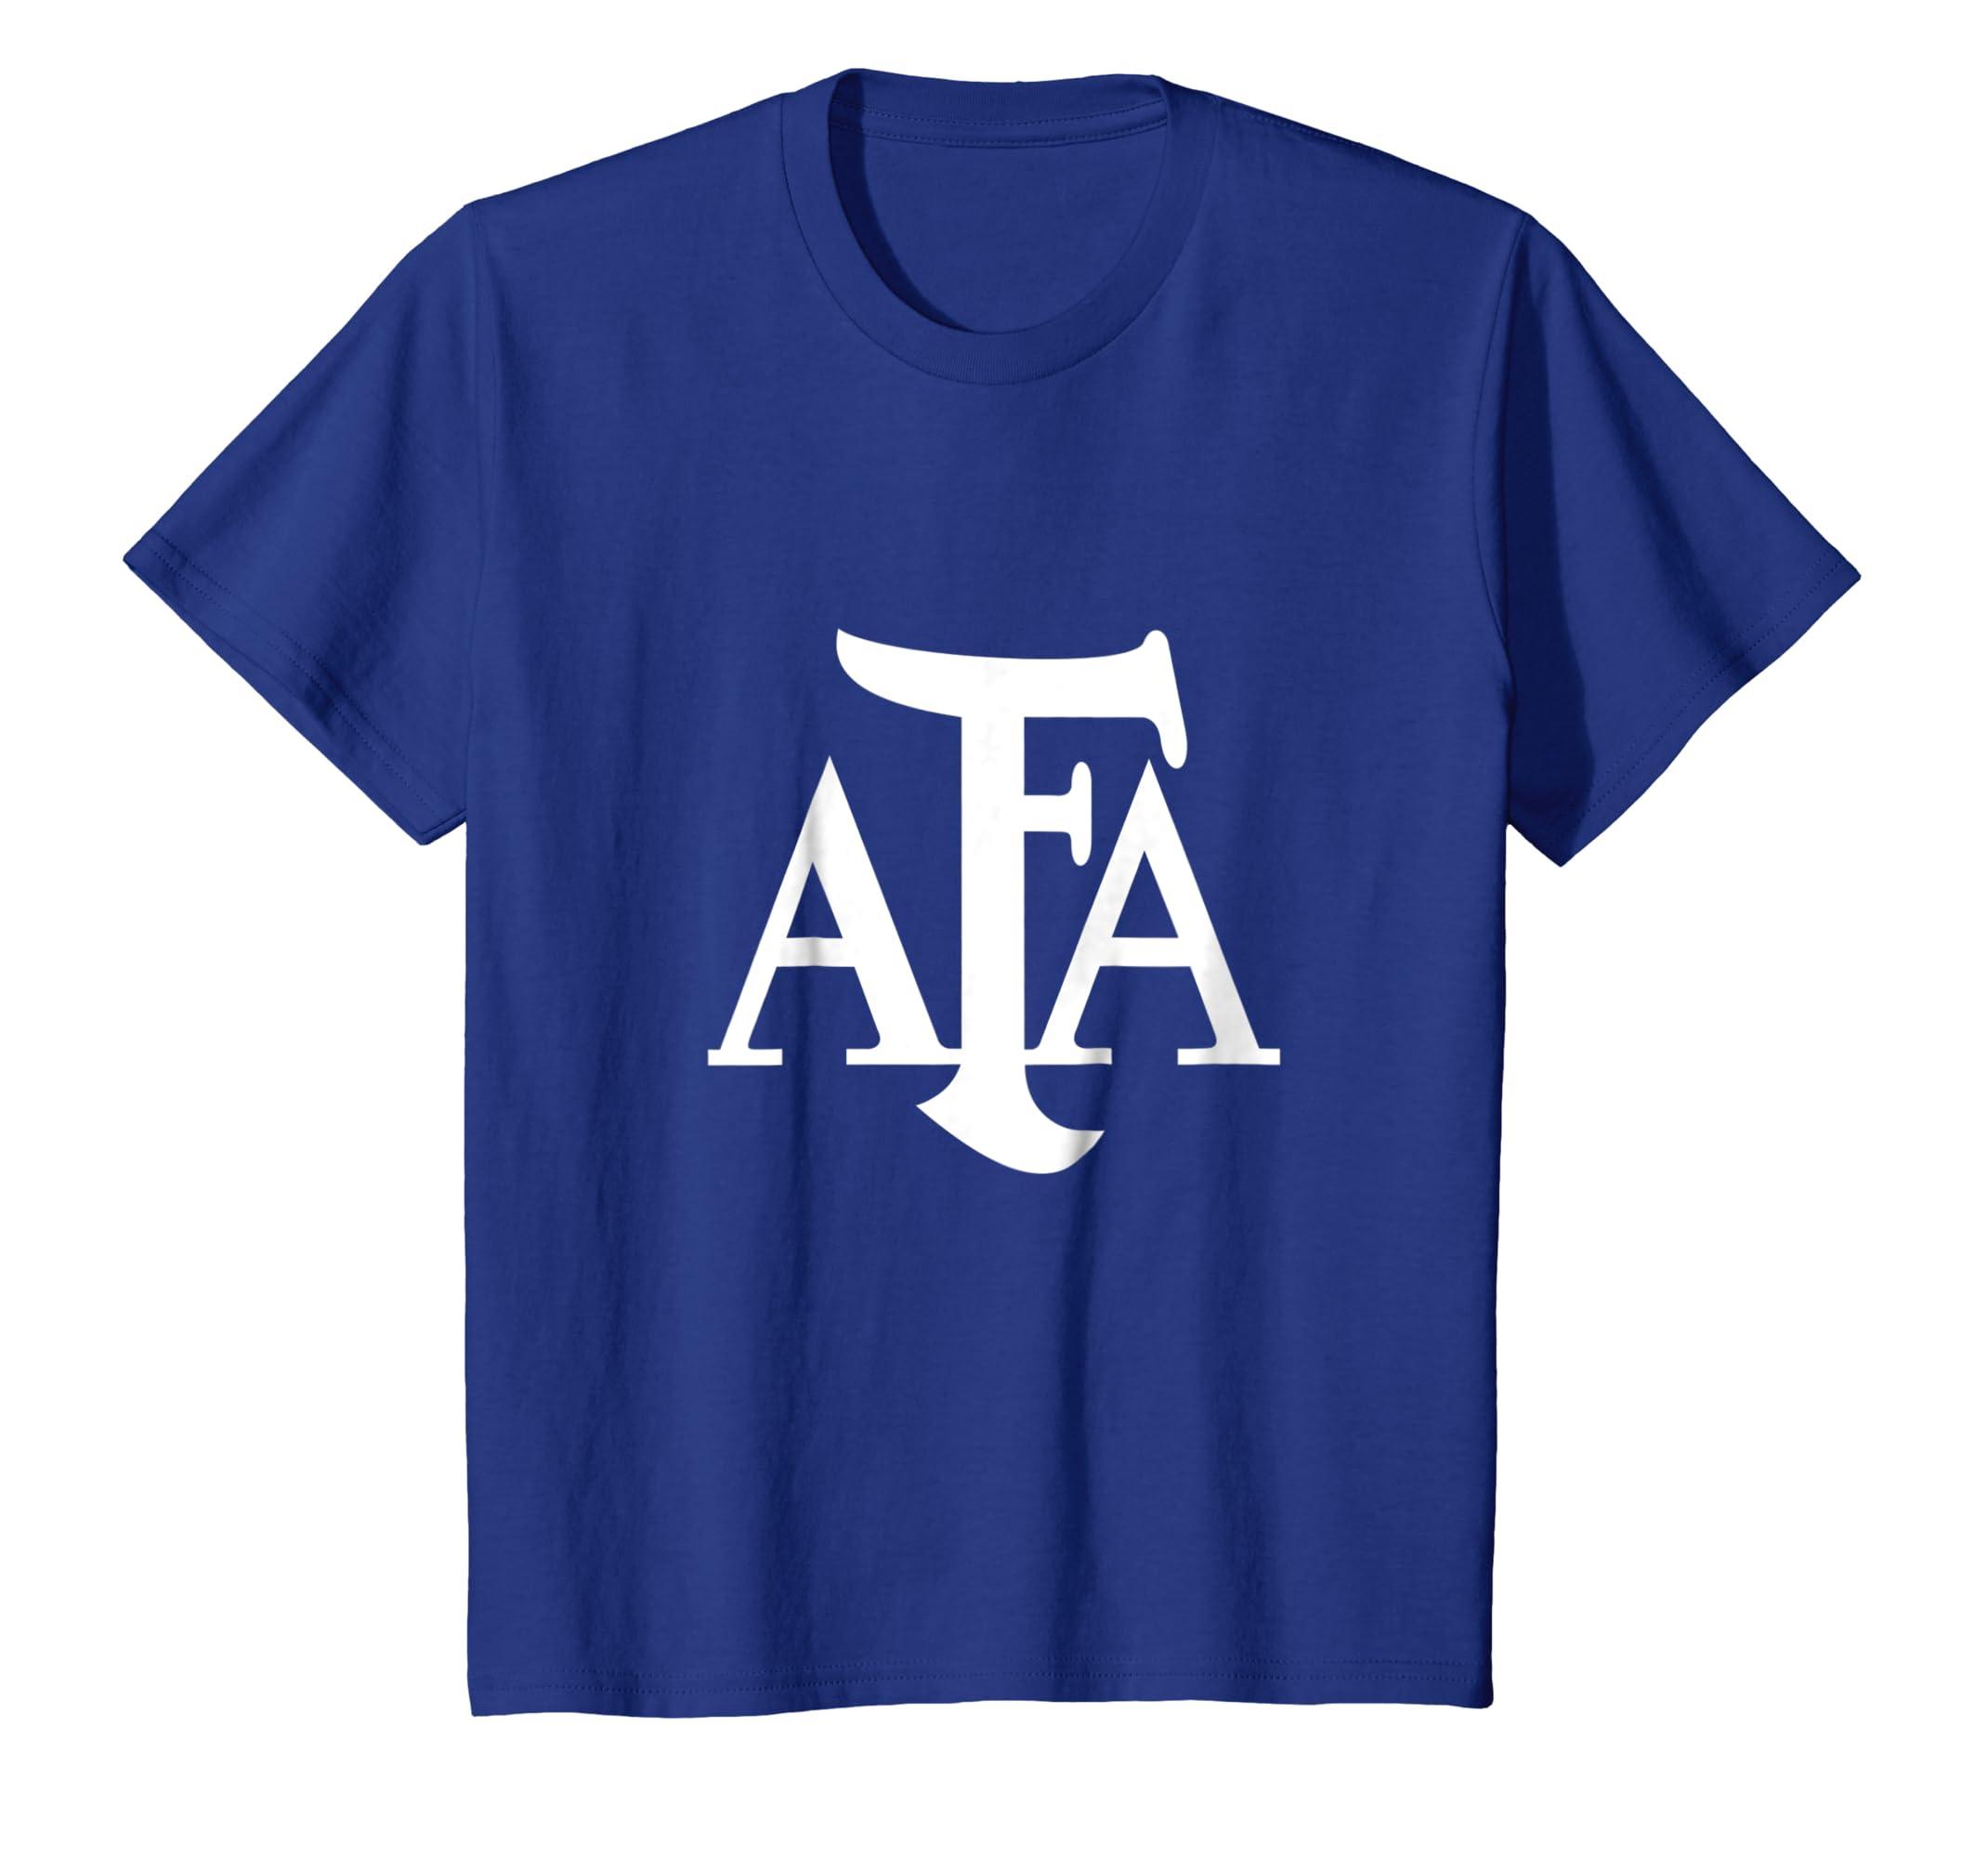 Amazon.com: Seleccion Argentina de Futbol Camiseta TShirt Jersey Mundial: Clothing